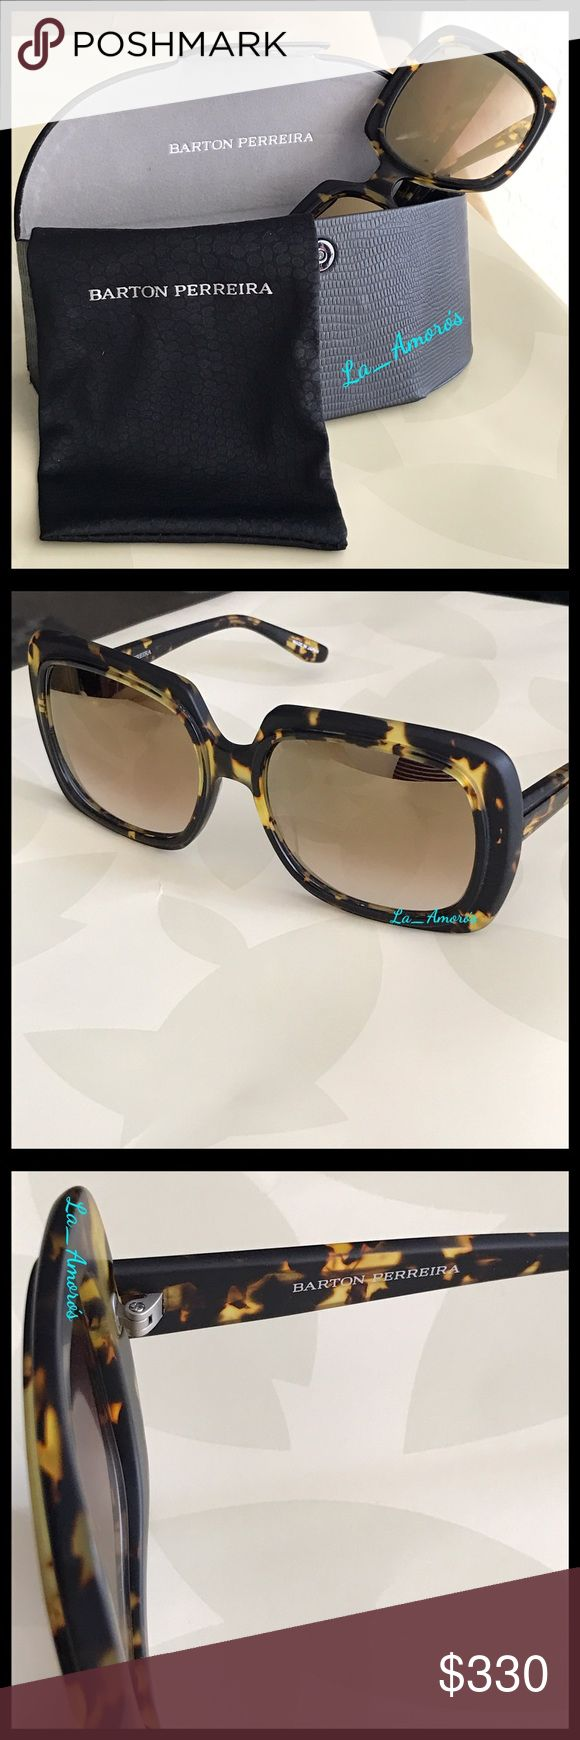 Barton Perreira Sunglasses (% Authentic) % Authentic Barton Perreira Sunglasses •Style: Renaissance • Acetate Frame •100% UV gradient lenses •Made in Japan •NEW •Style #RENA5602 Barton Perreira Accessories Sunglasses